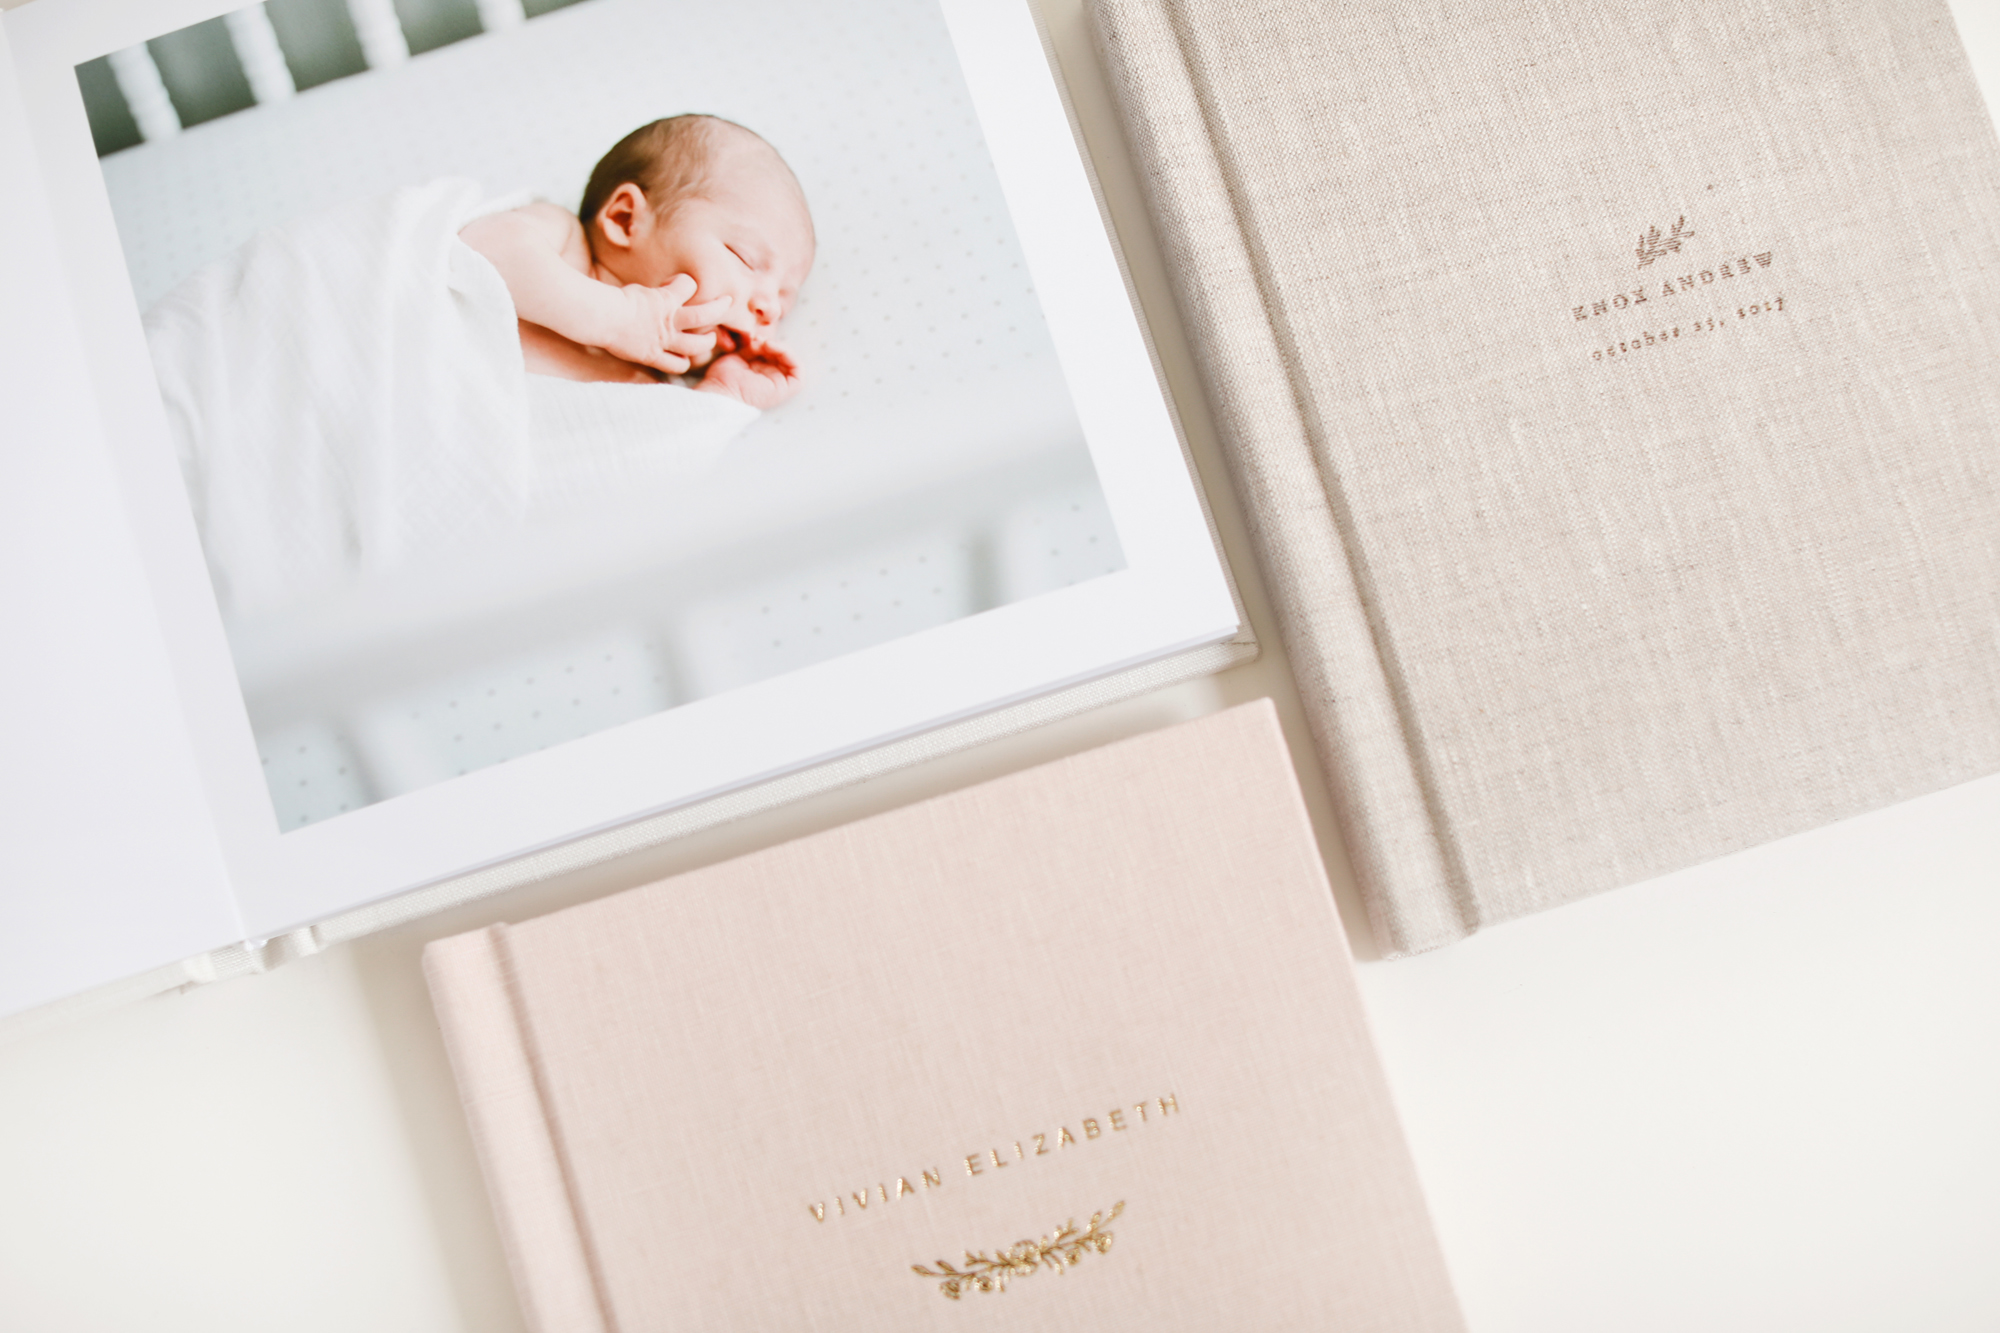 raleigh-lifestyle-newborn-film-photographer-albums-baby-books-001